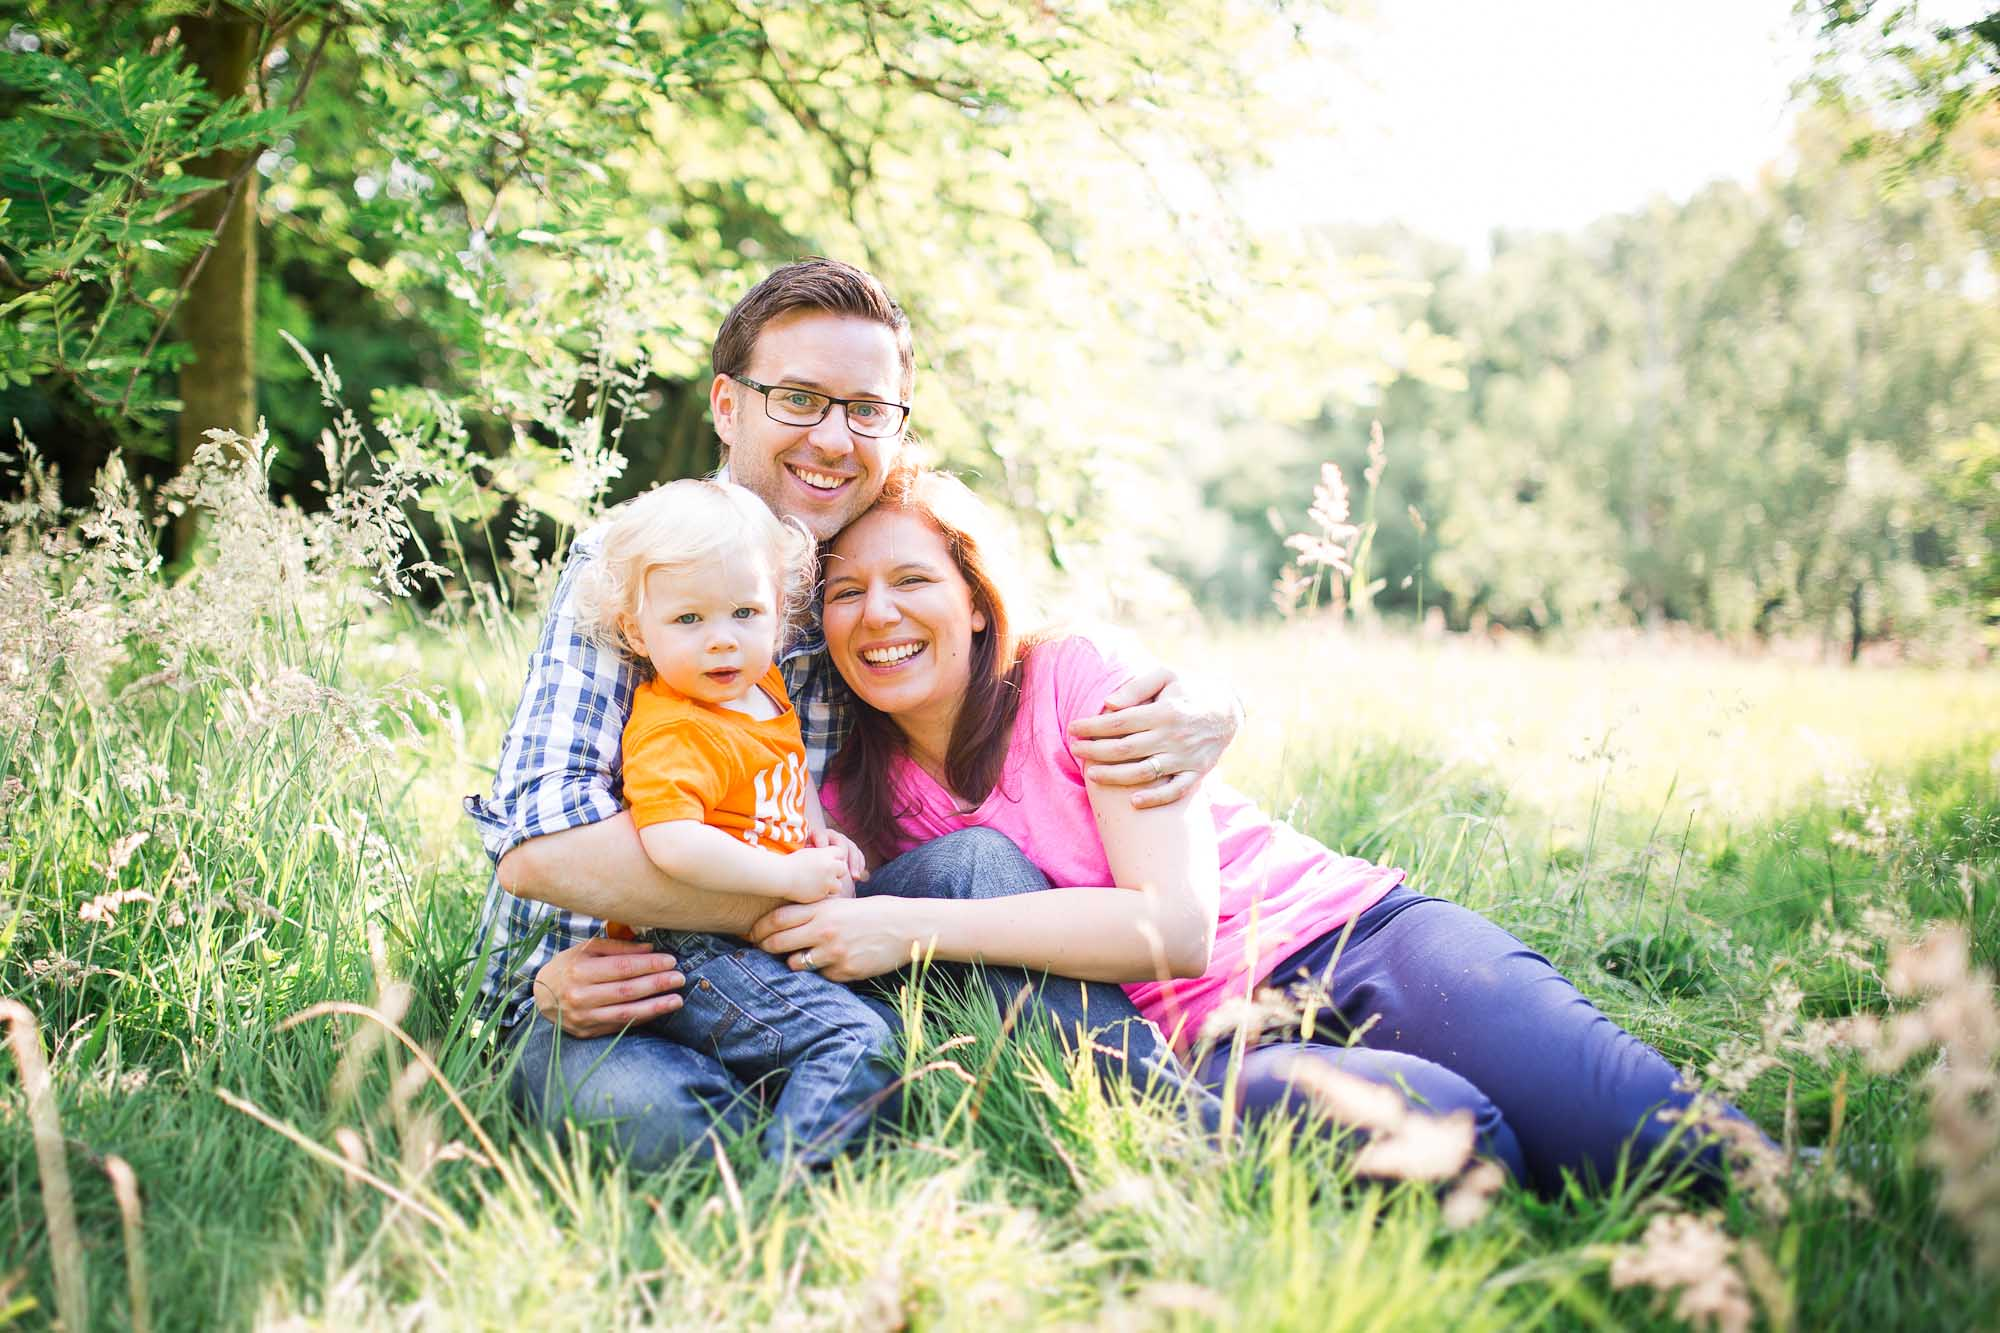 Family-Portrait-Photography-Maidstone-Kent-24.jpg